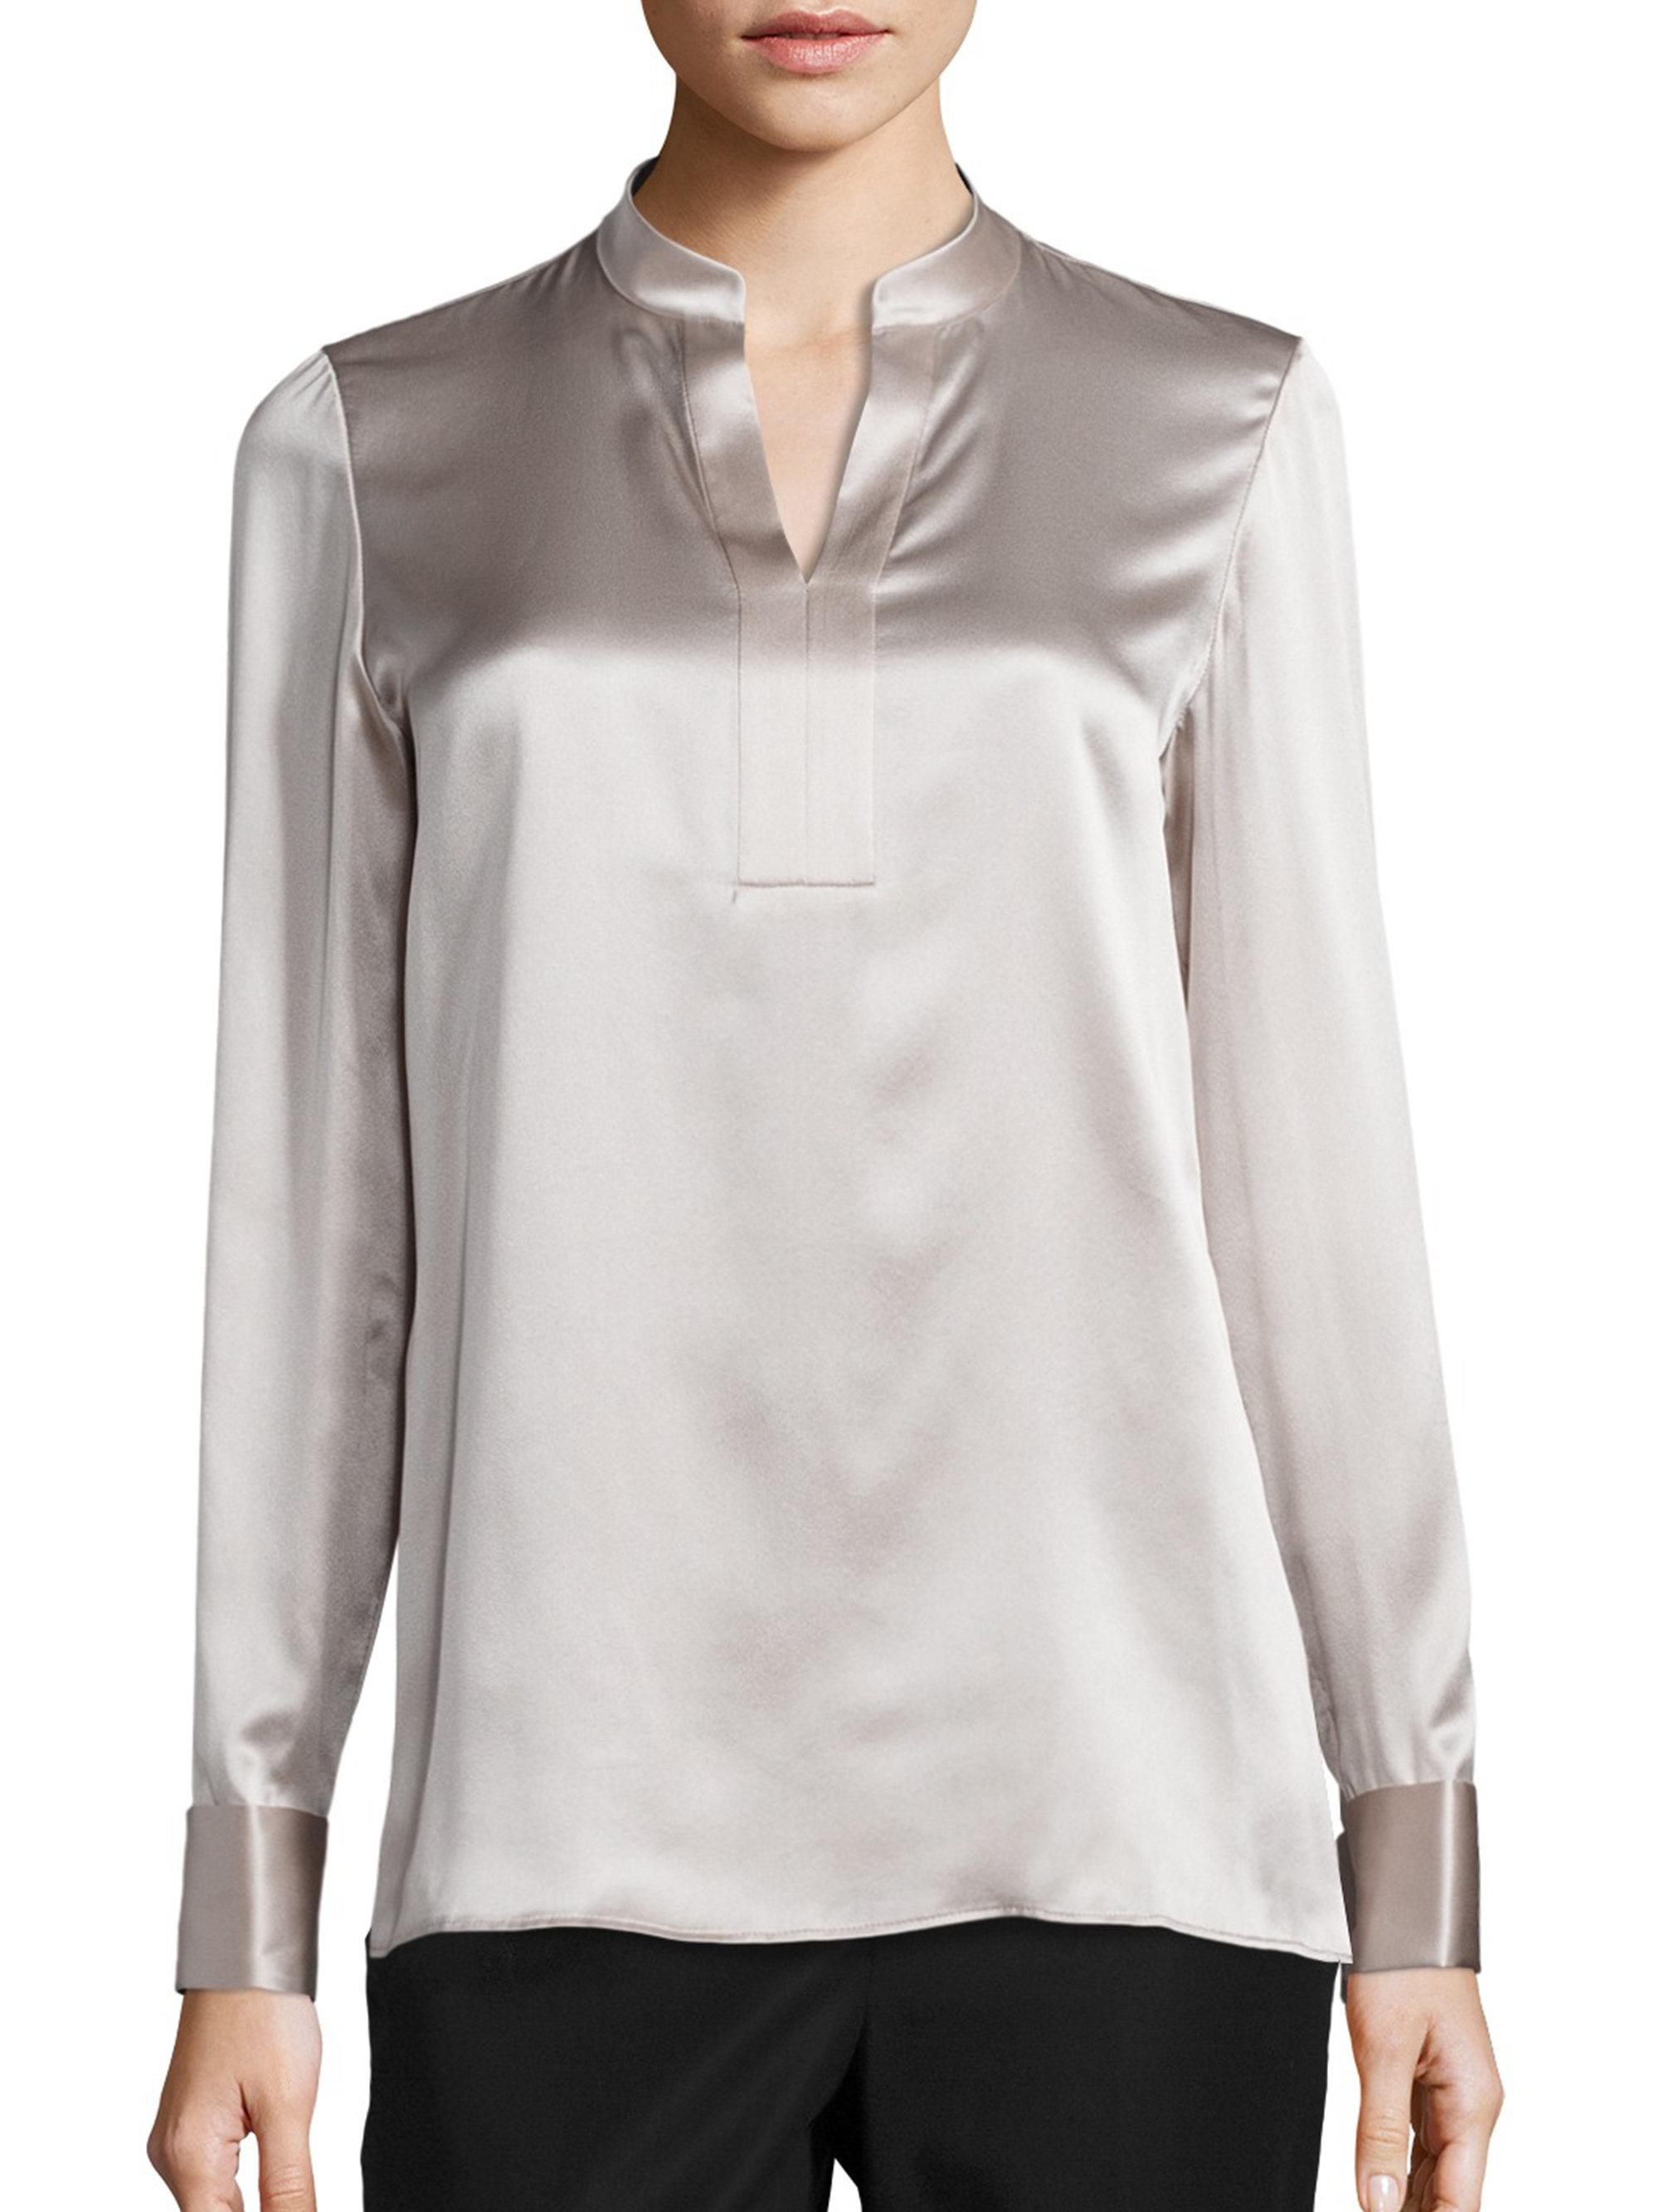 Black Collared Shirt Women